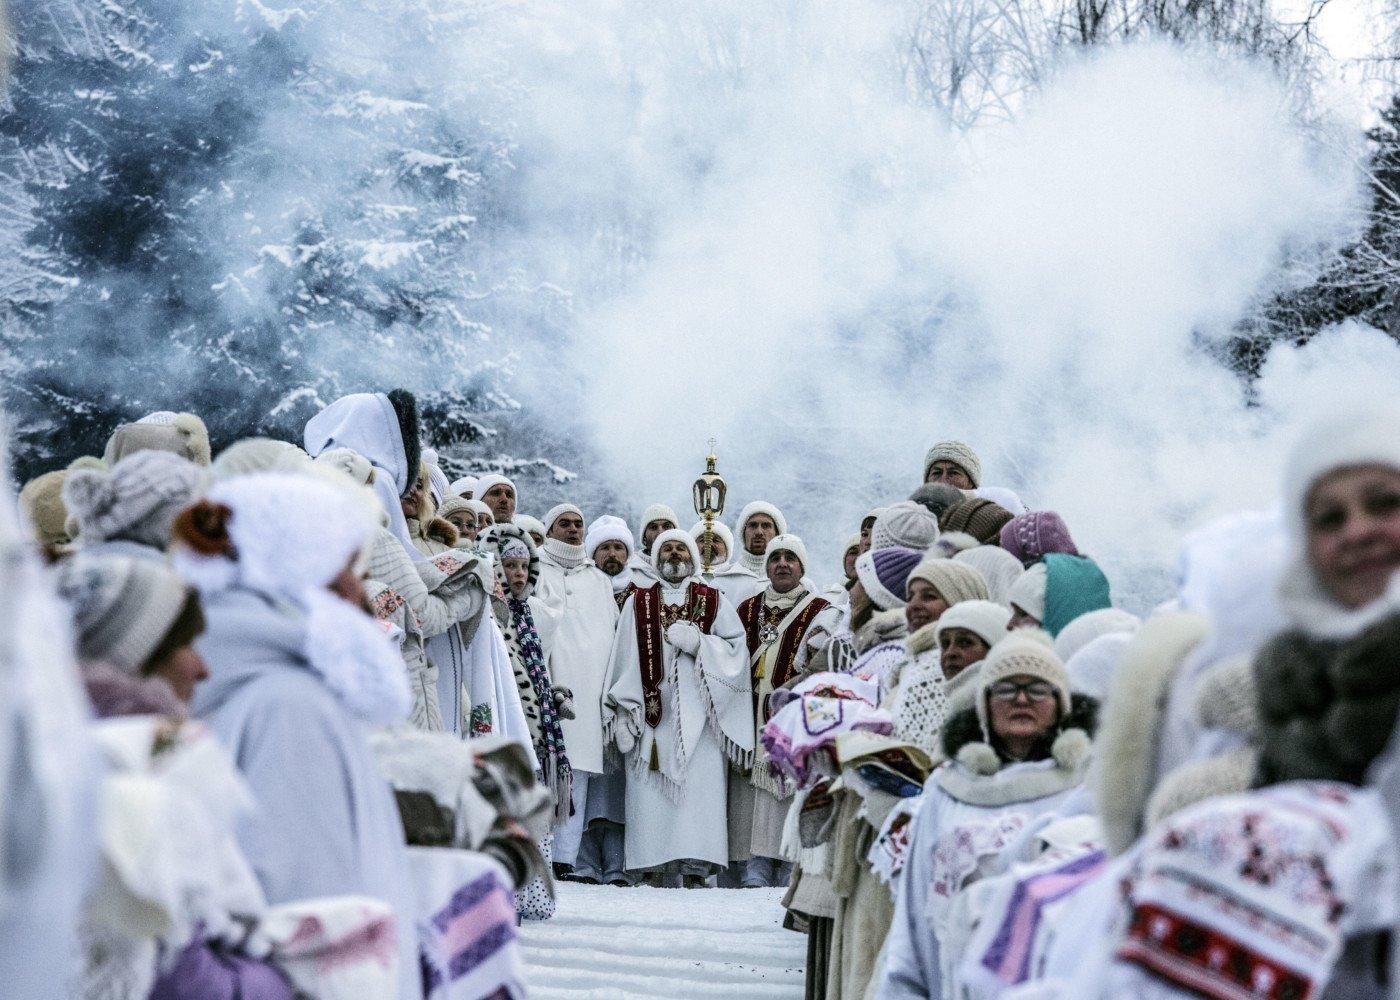 Choir Hymns on the Birthday of Vissarion, Krasnoyarsk Territory, Russia, 2015